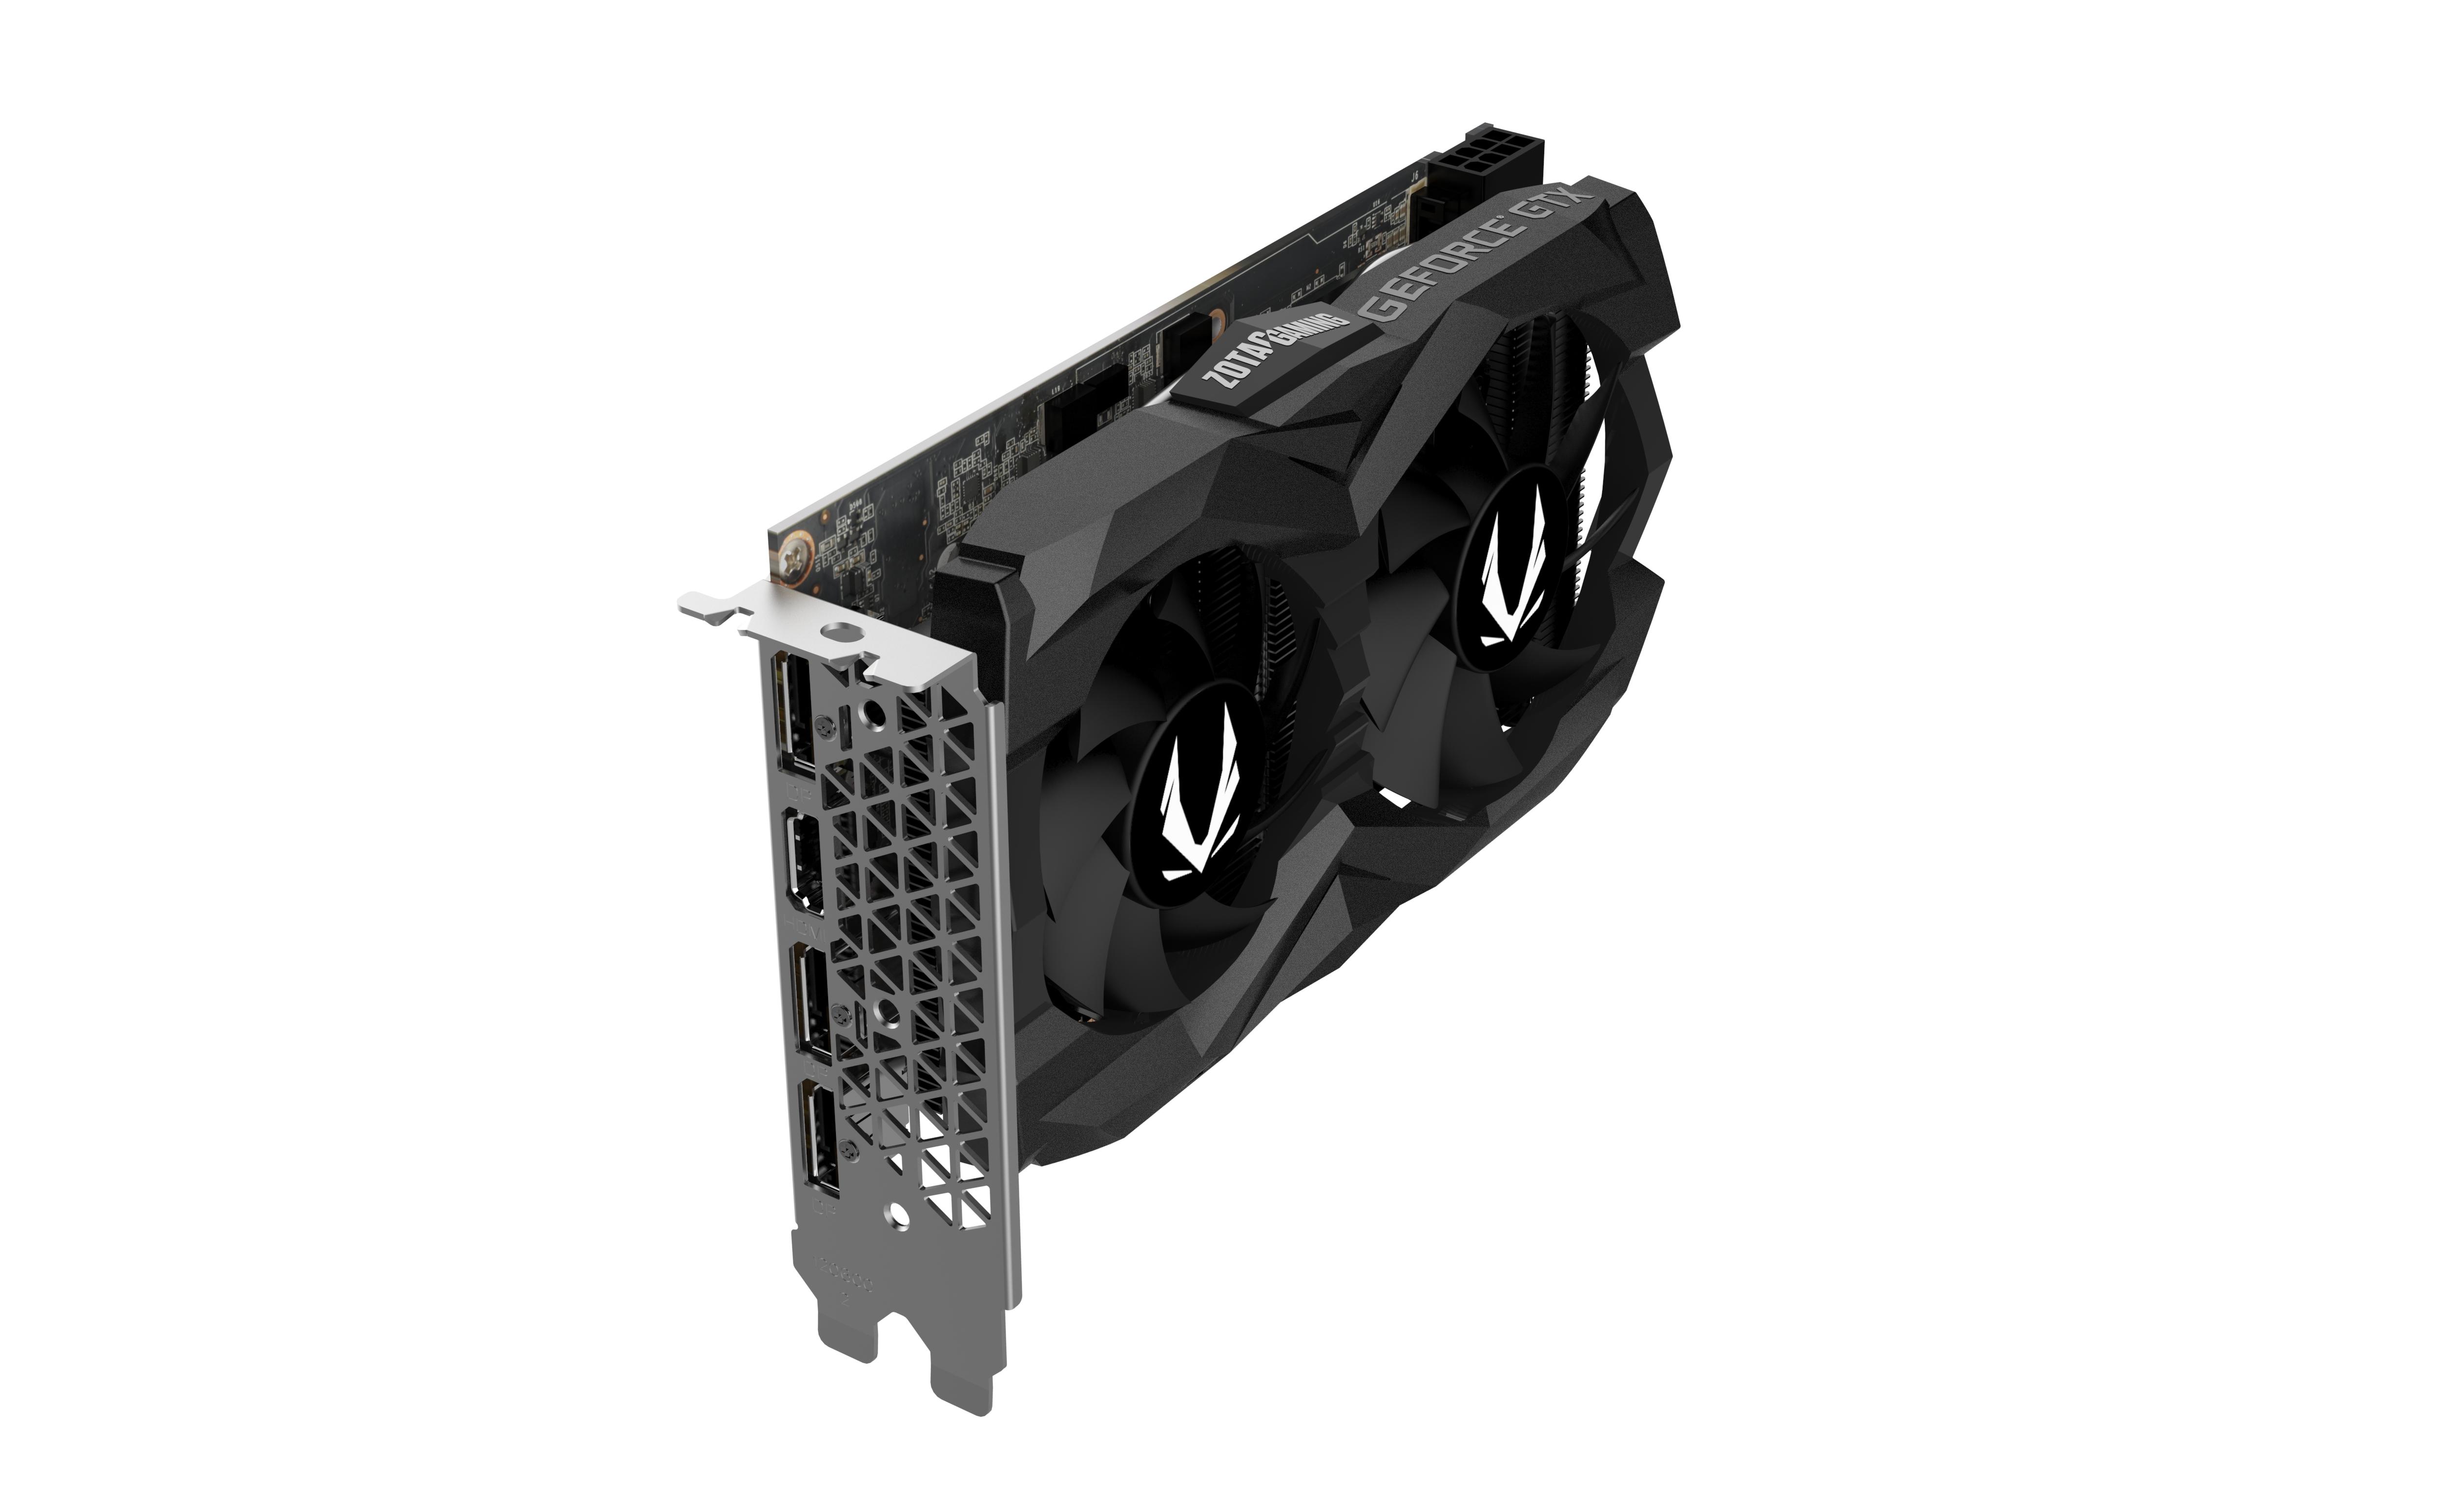 GeForce GTX 1660 Ti Roundup